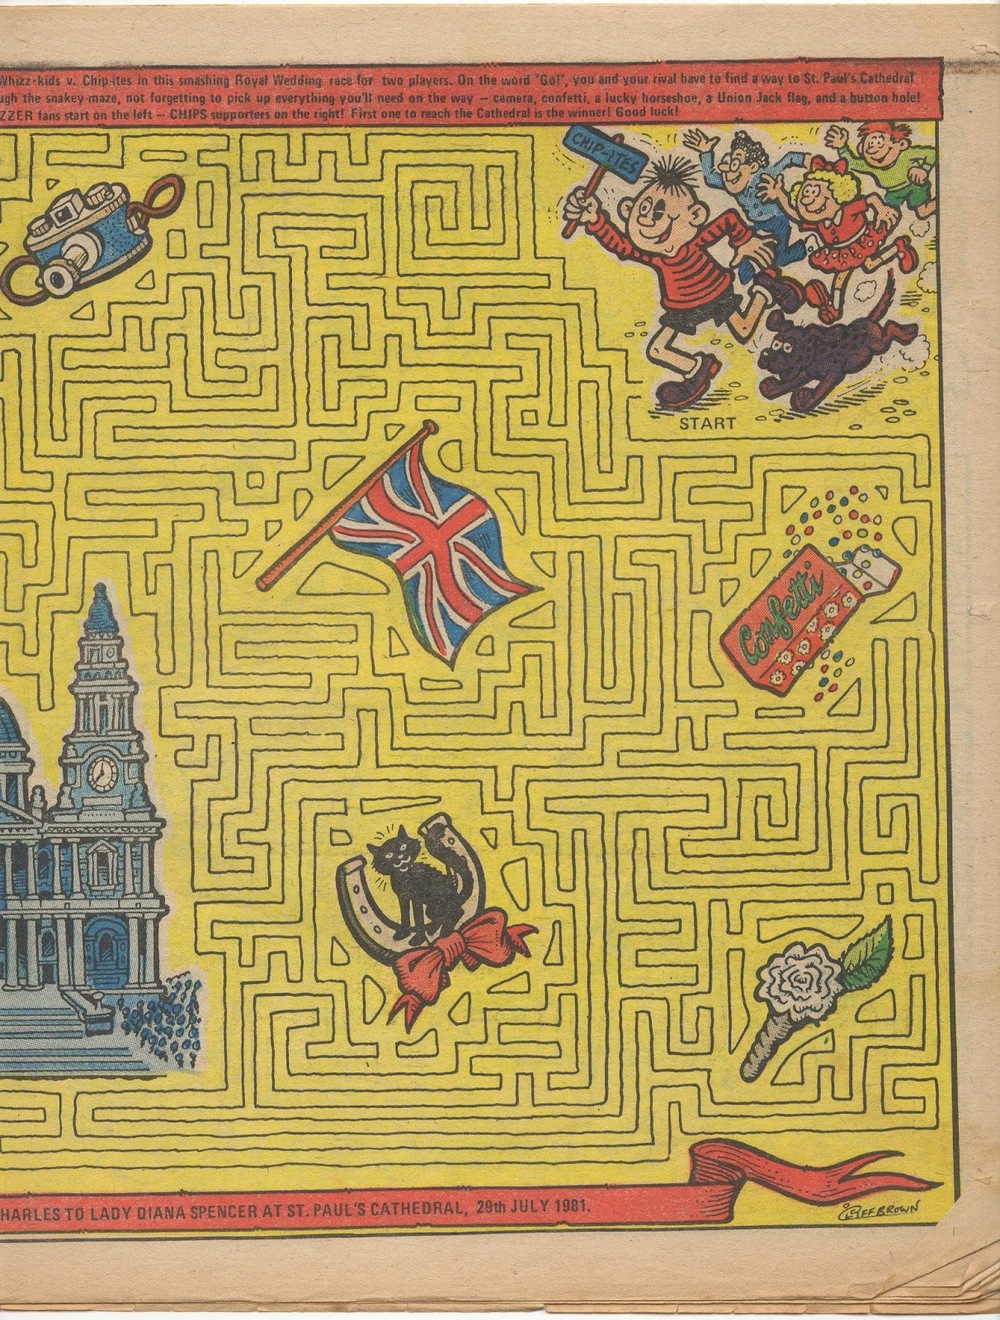 Whizz-kids v Chip-ites Maze Chase: Cliff Brown (artist)